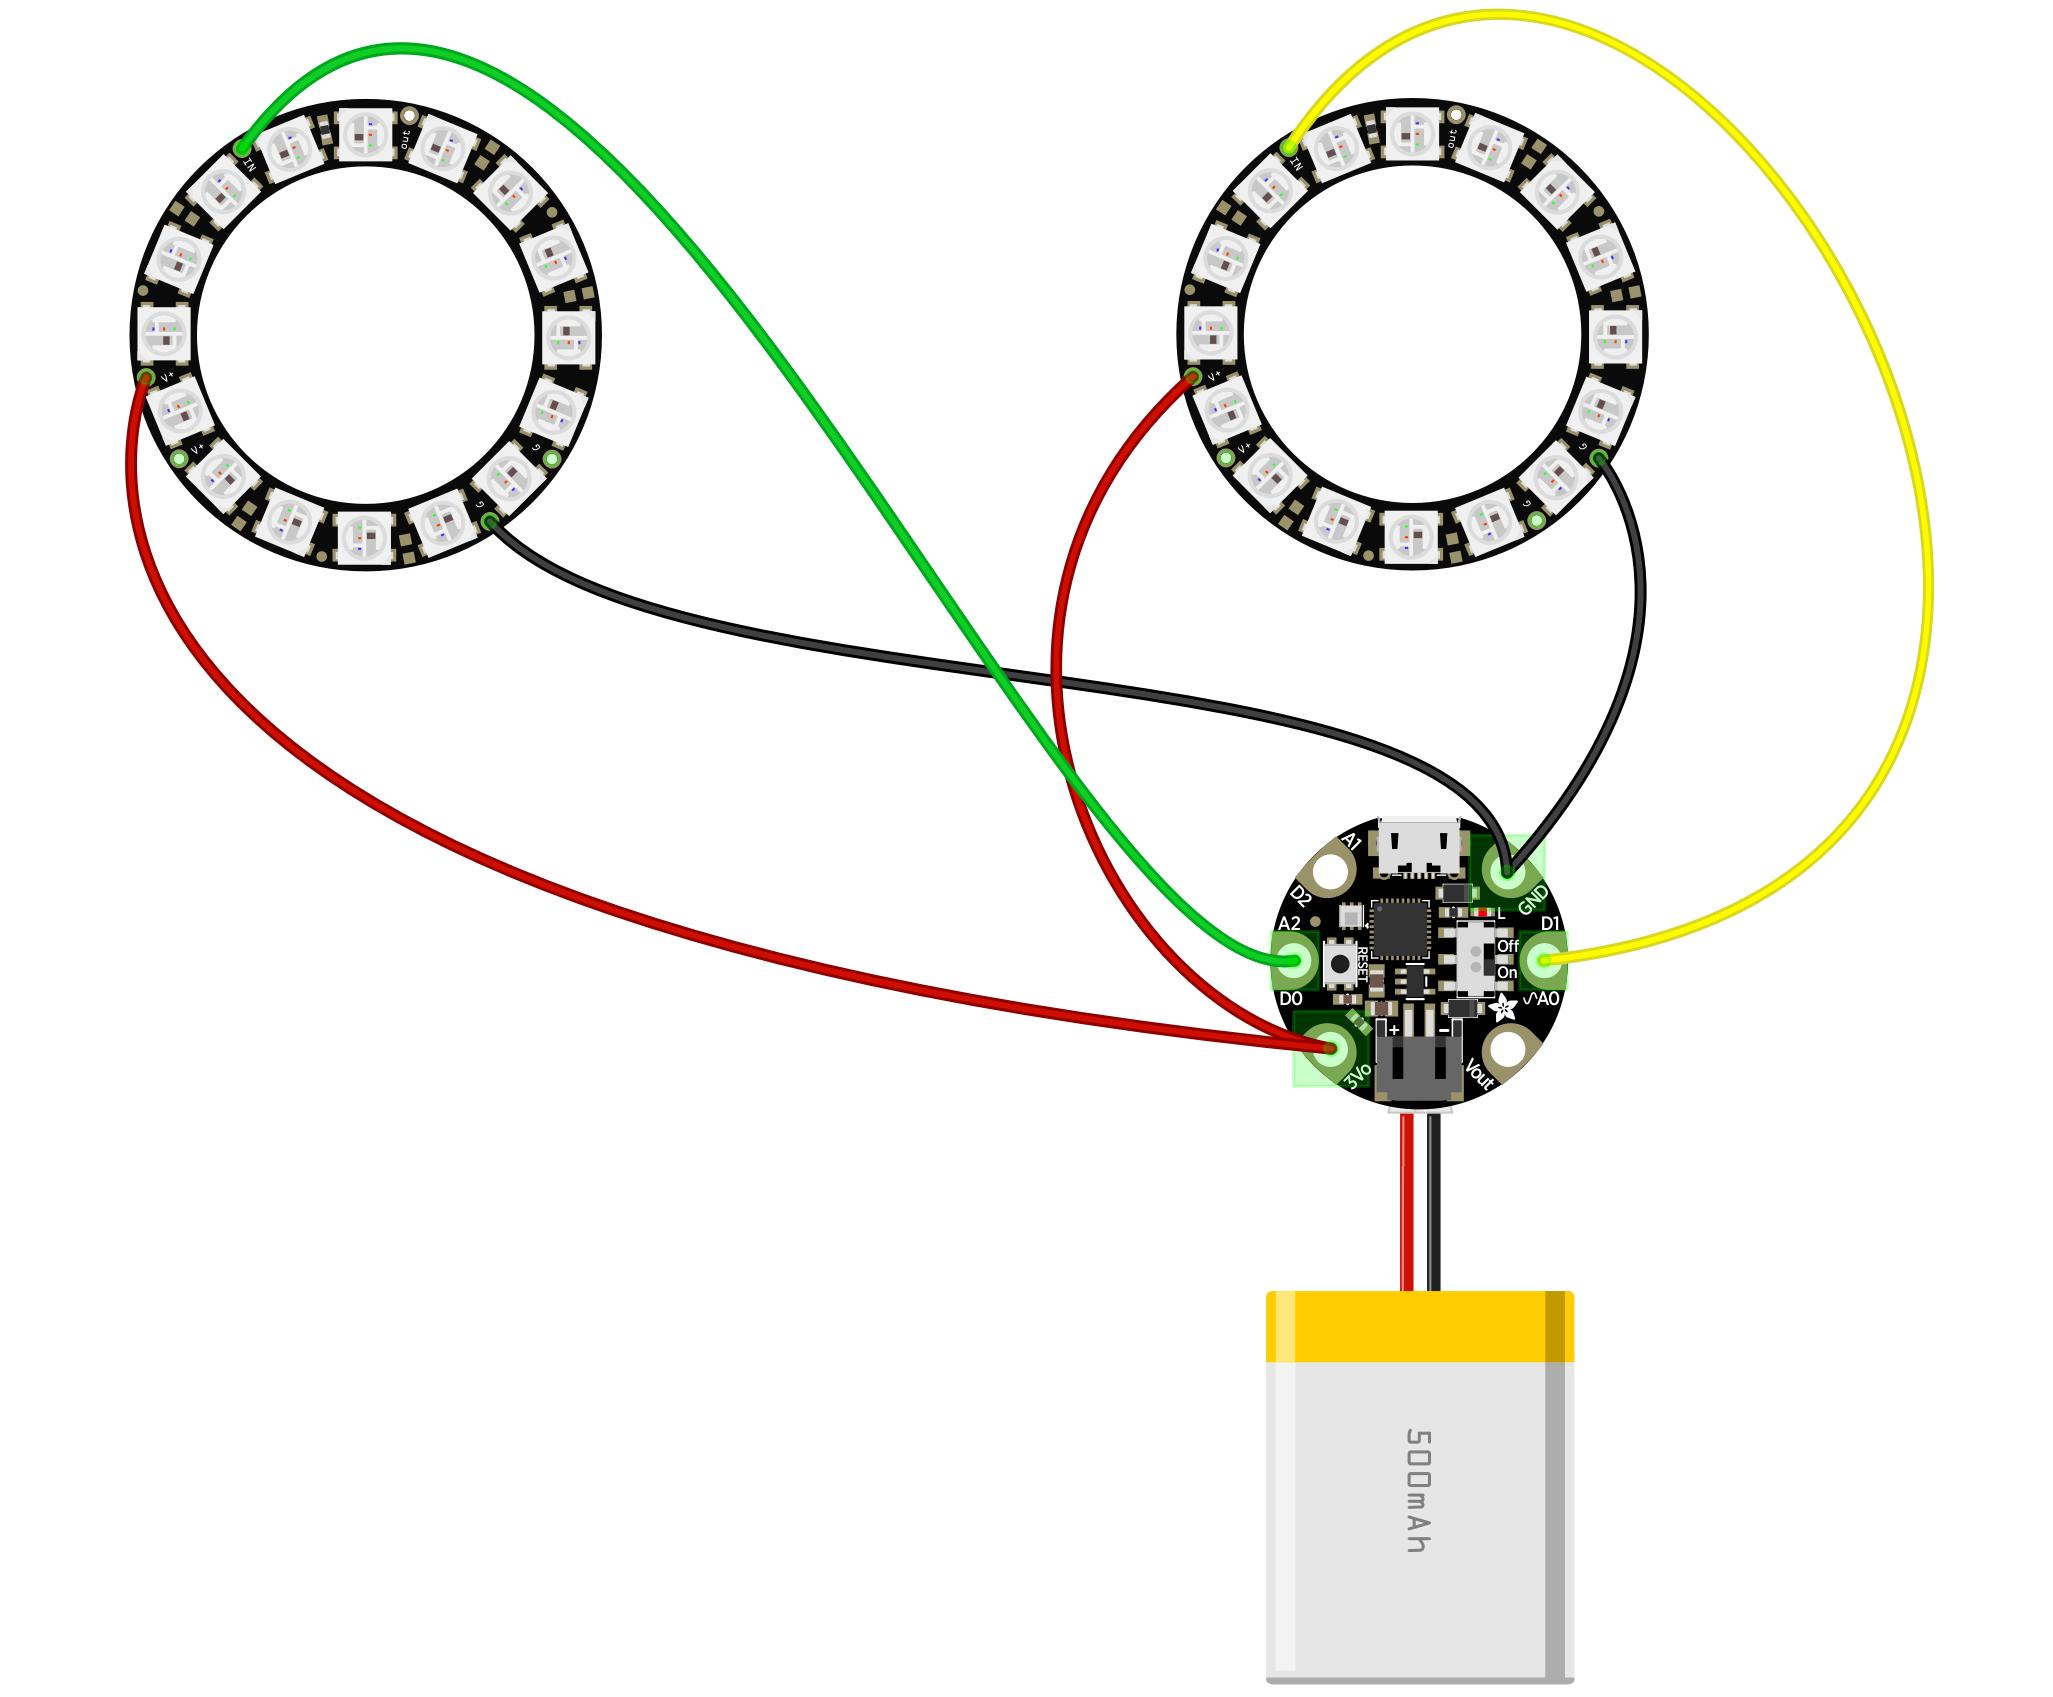 adafruit_gemma_cogGoggles_circuit.jpg